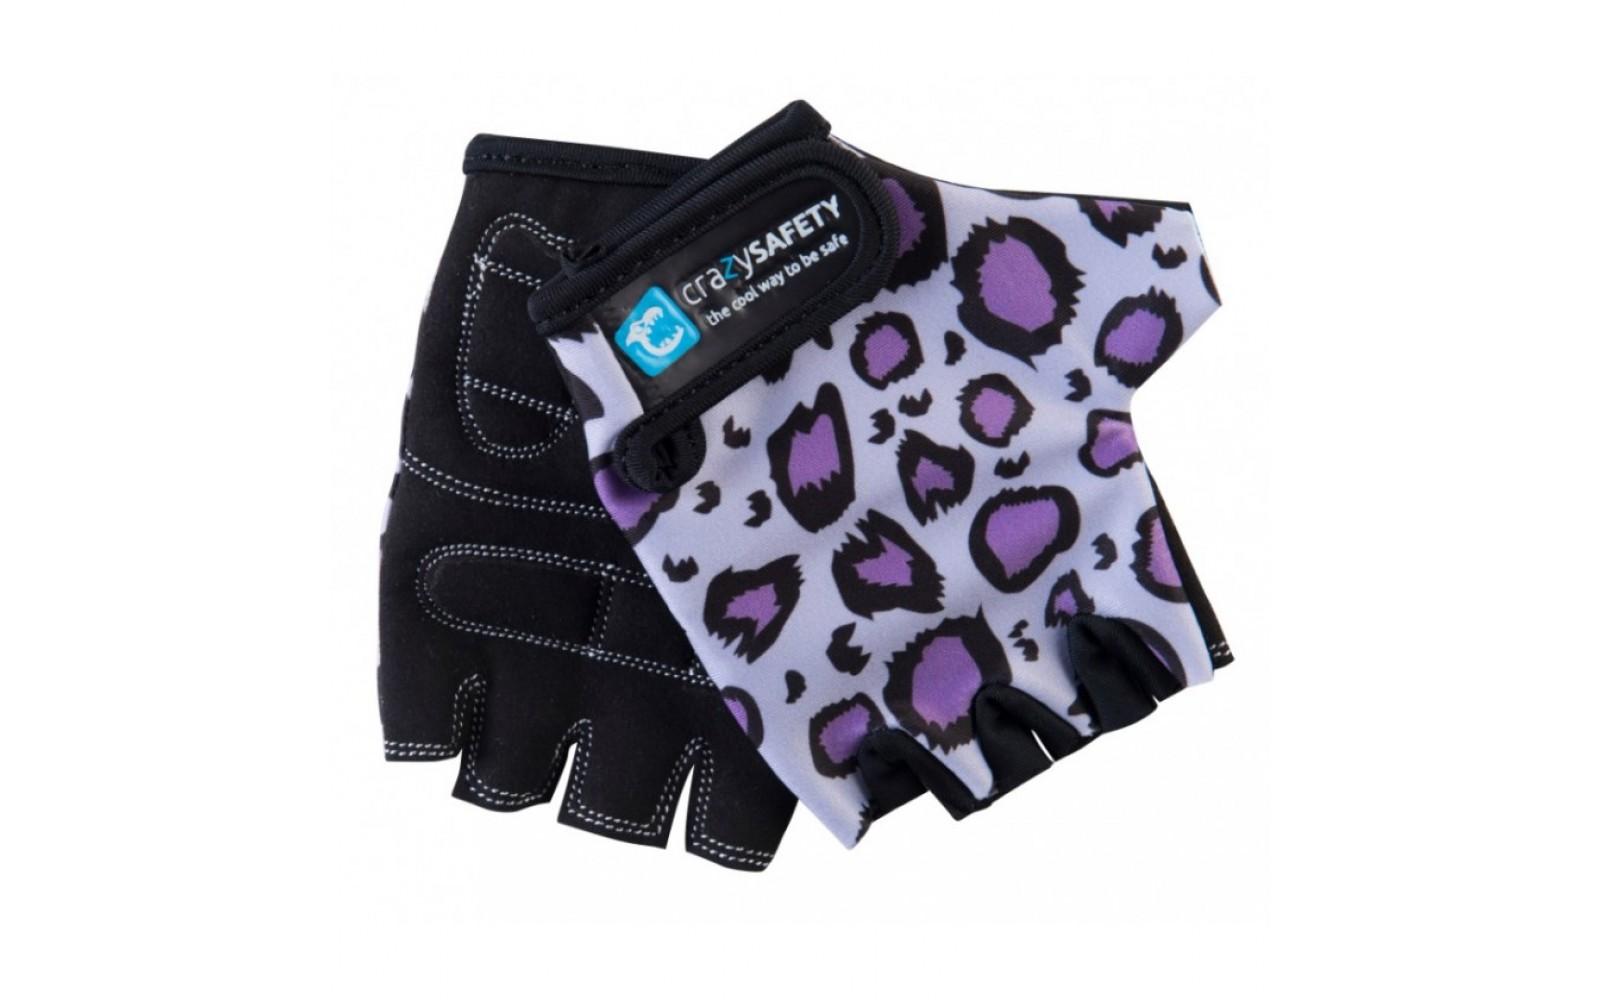 Перчатки Purple Leopard (сиреневый леопард) Crazy Safety